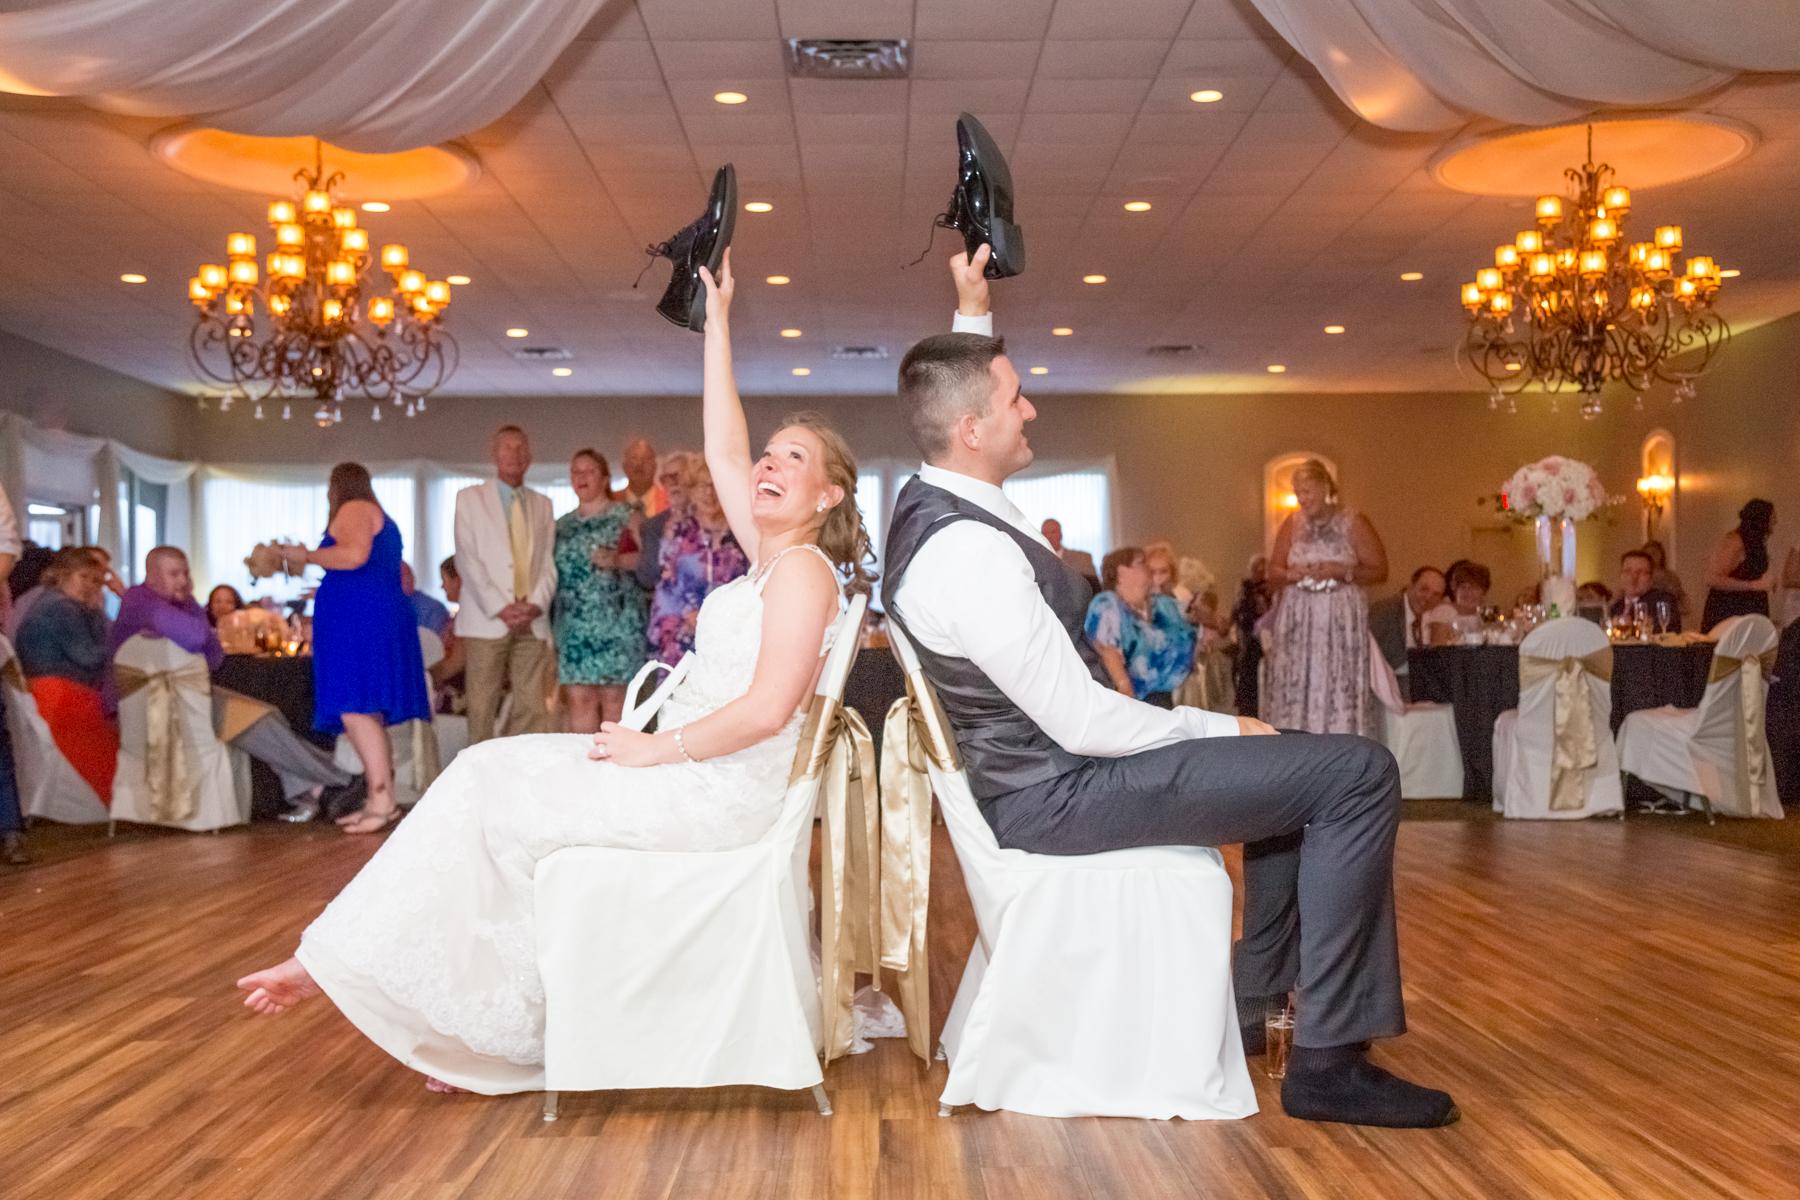 Breanna & Adam – Scott Township, PA